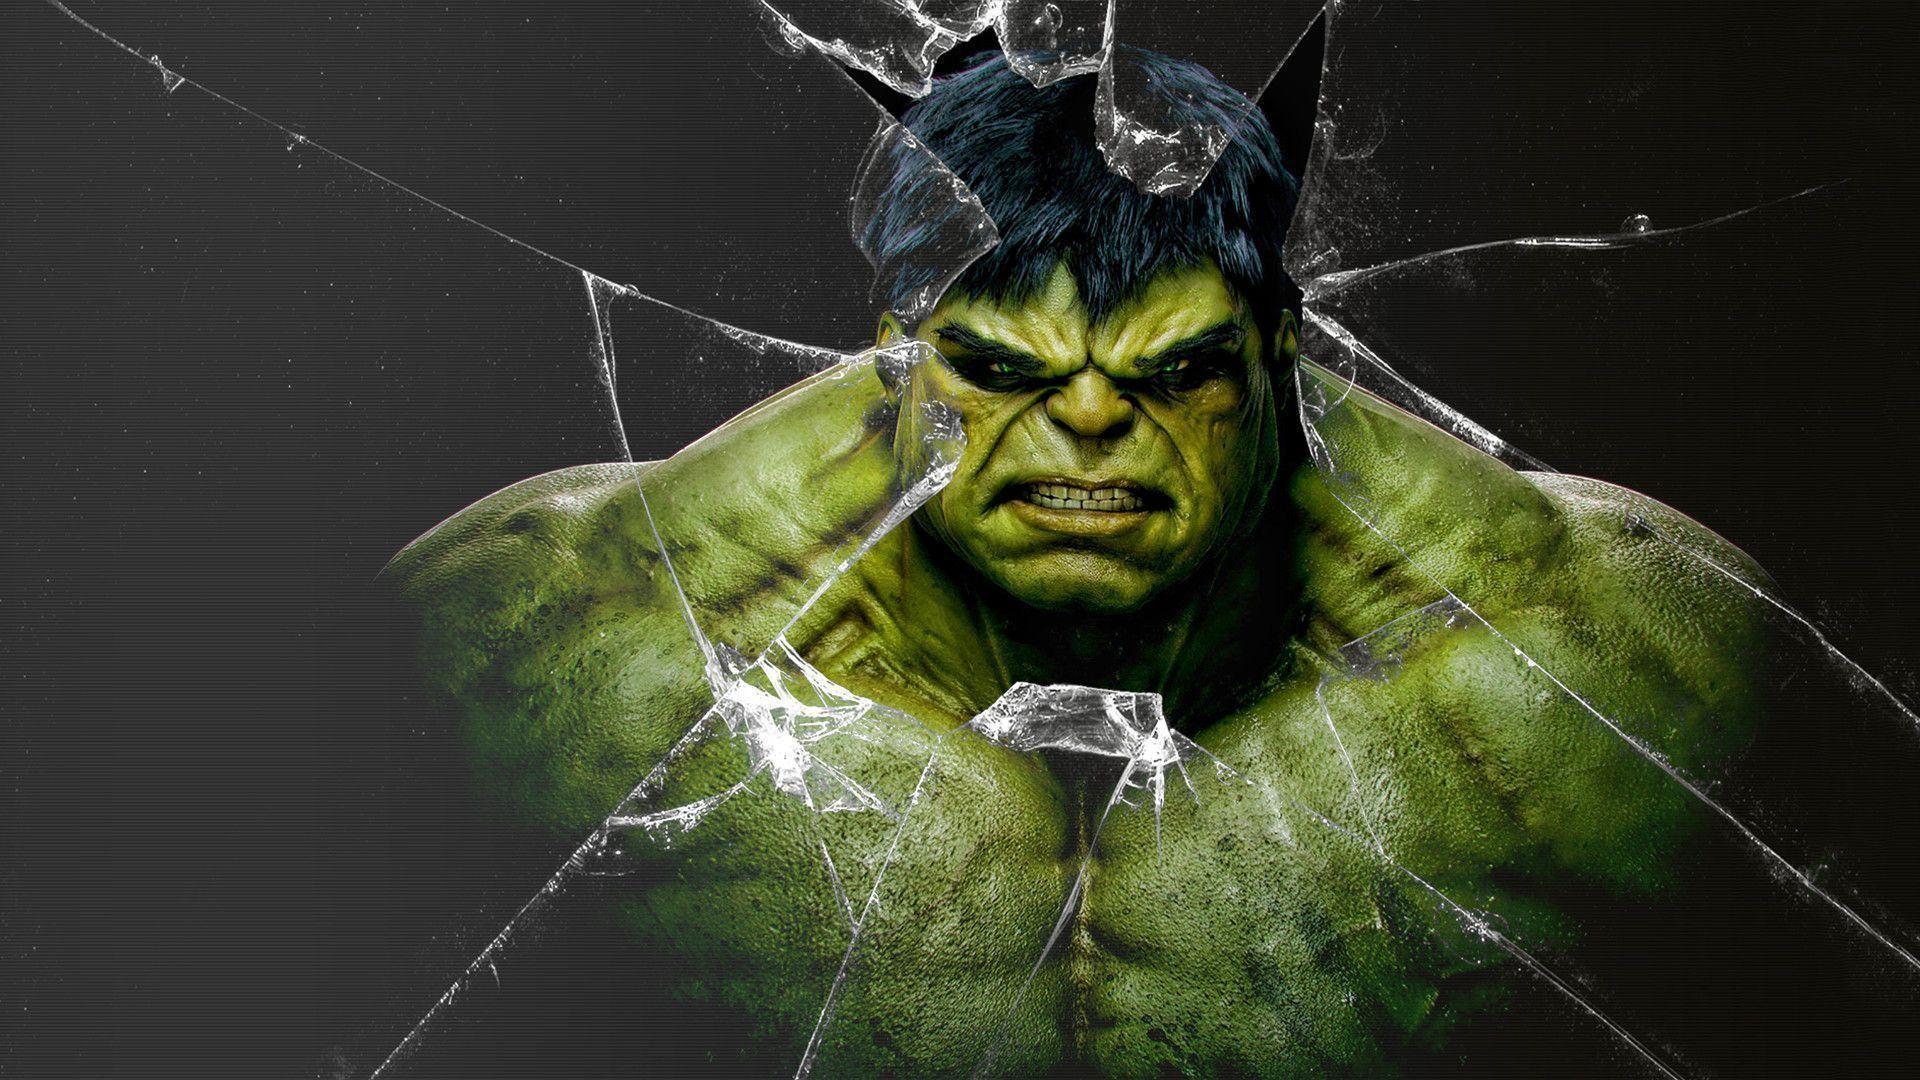 Hulk HD Wallpaper | Incredible Hulk Movie Wallpaper | Cool Wallpapers